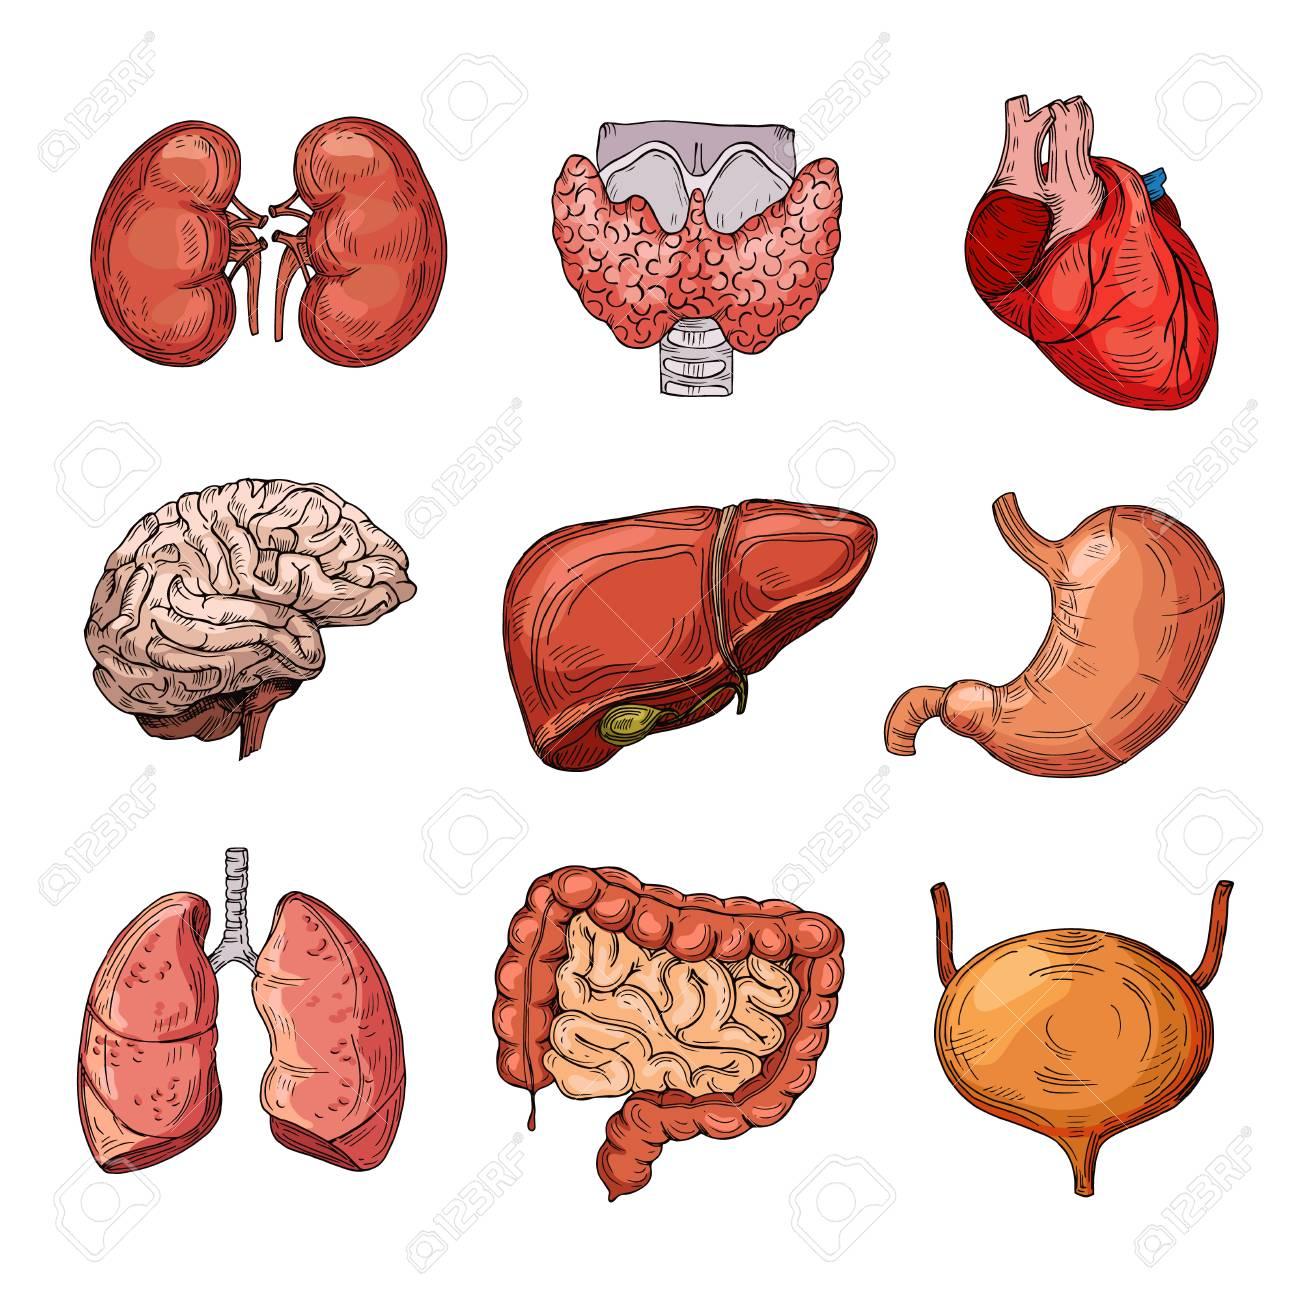 Human Internal Organs Cartoon Brain And Heart Liver And Kidneys